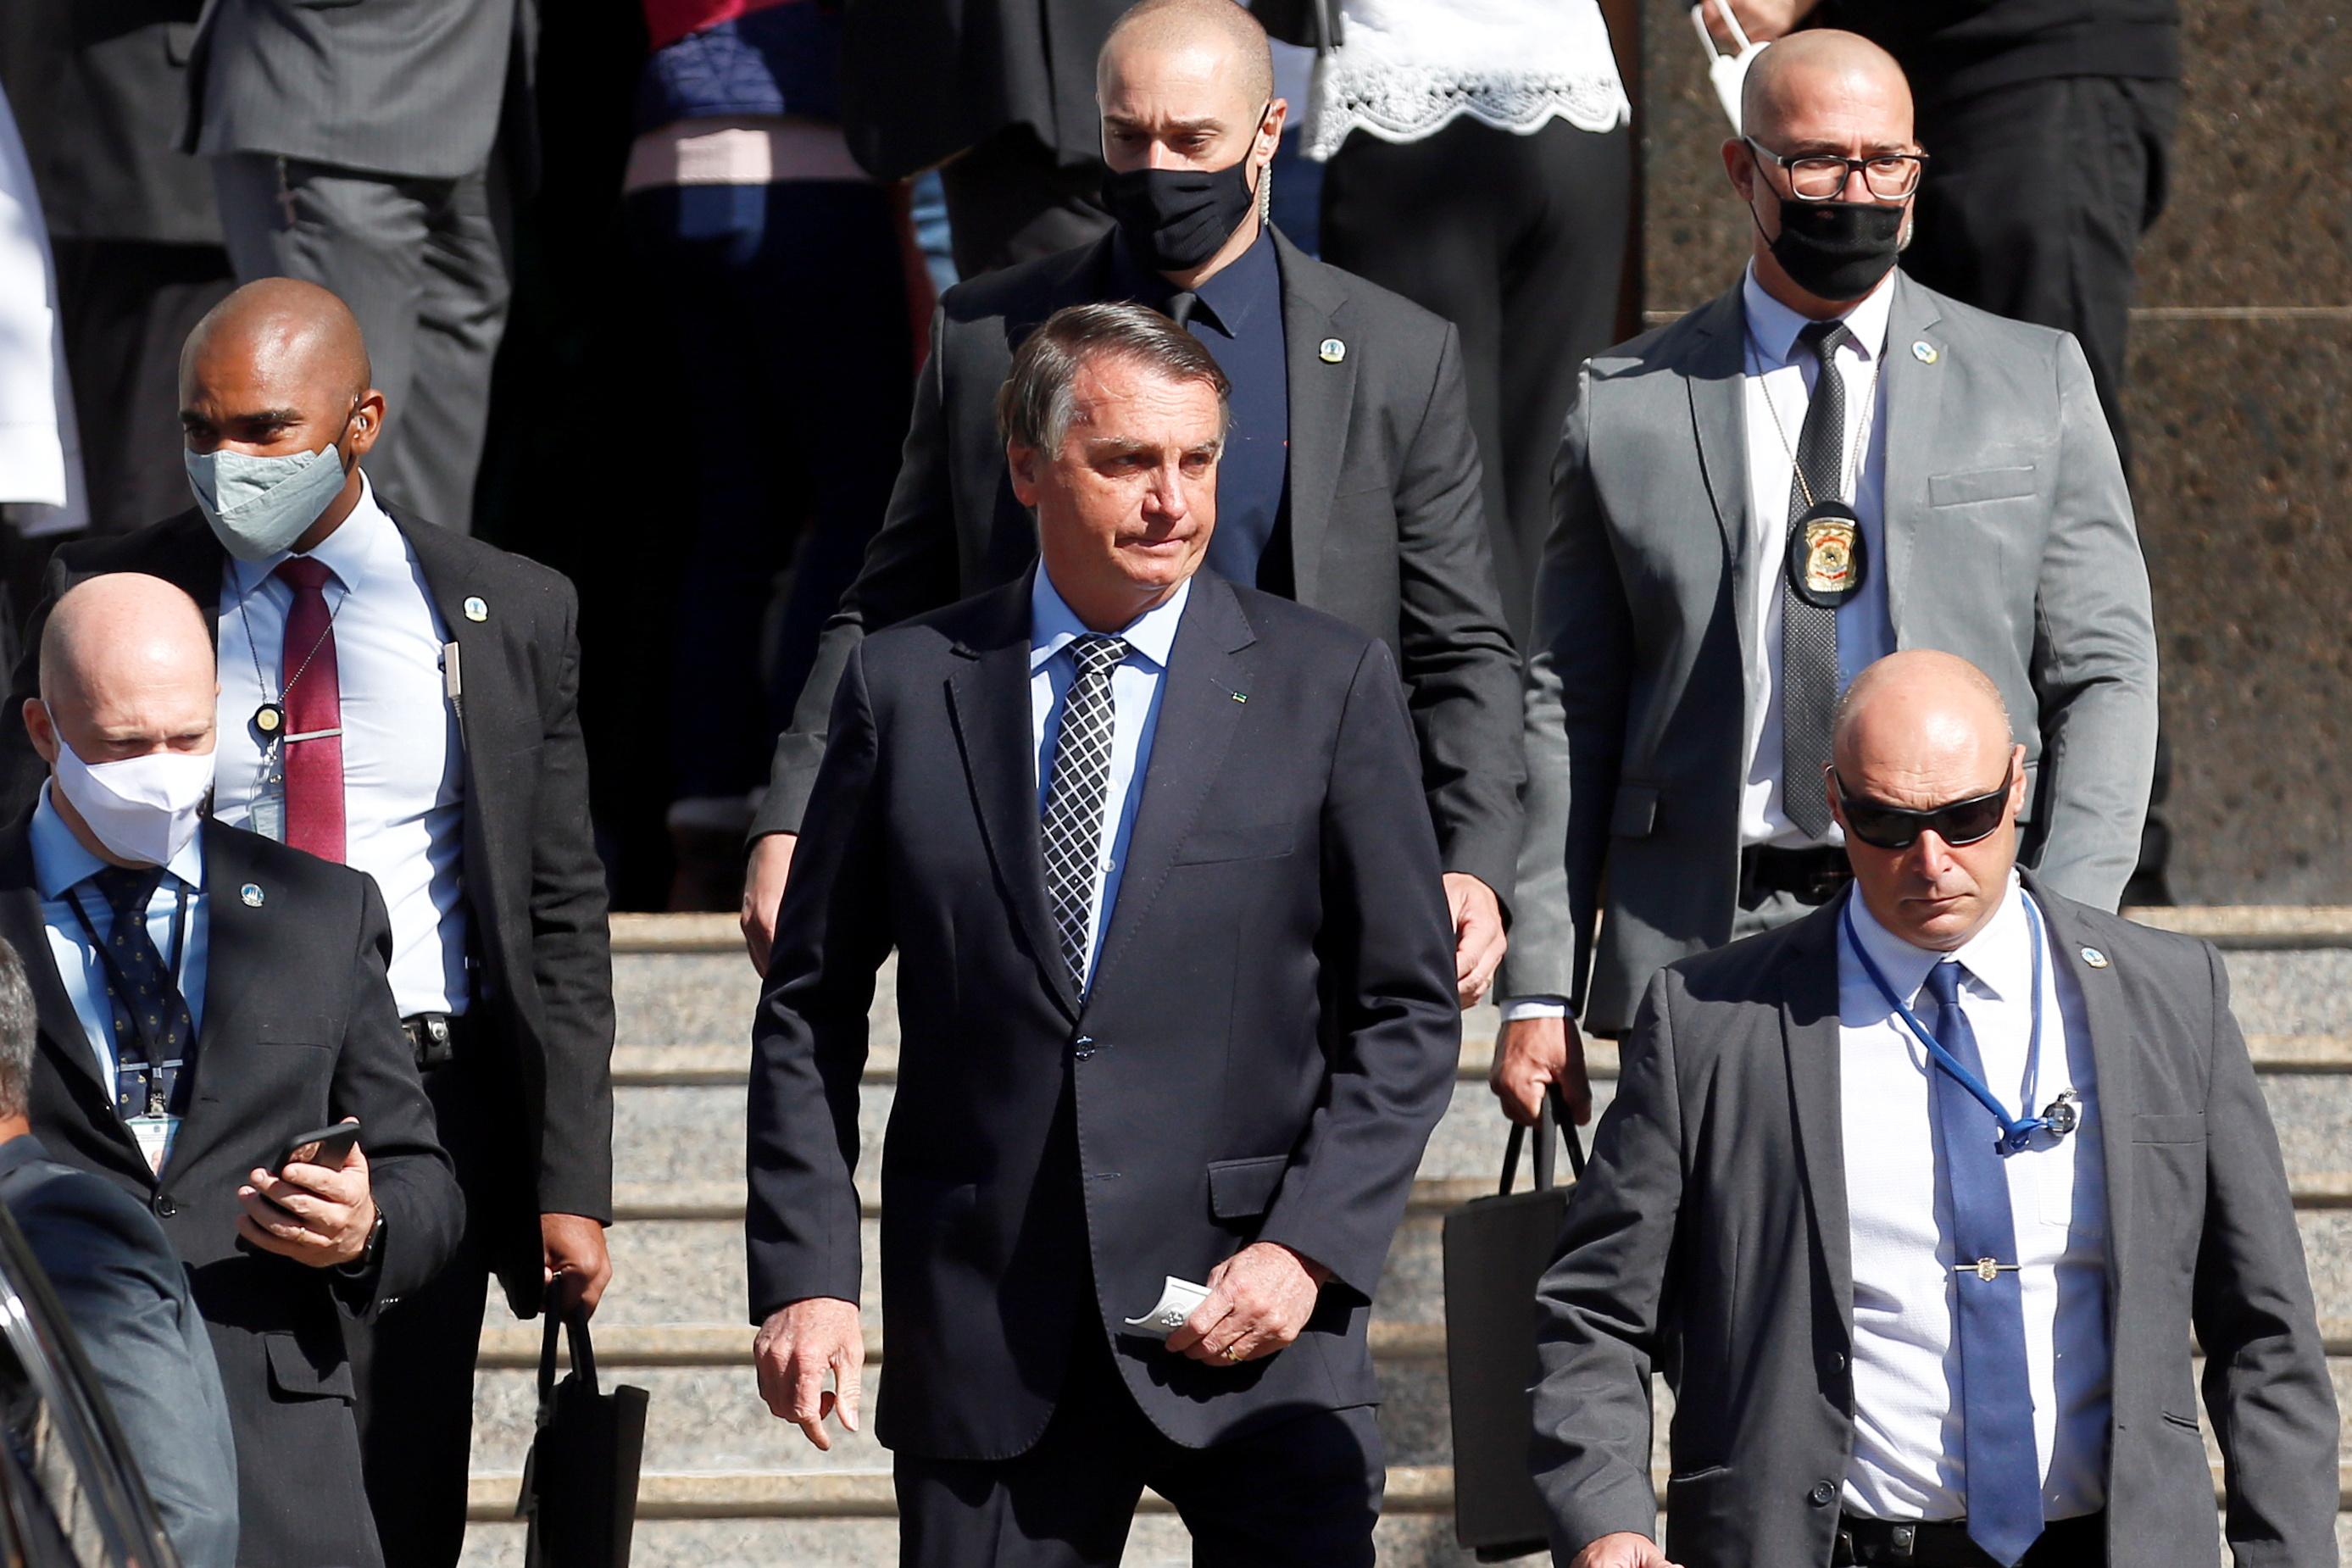 Brazil's President Jair Bolsonaro walks after attending Mass at a Catholic church in Brasilia, Brazil July 1, 2021. REUTERS/Adriano Machado